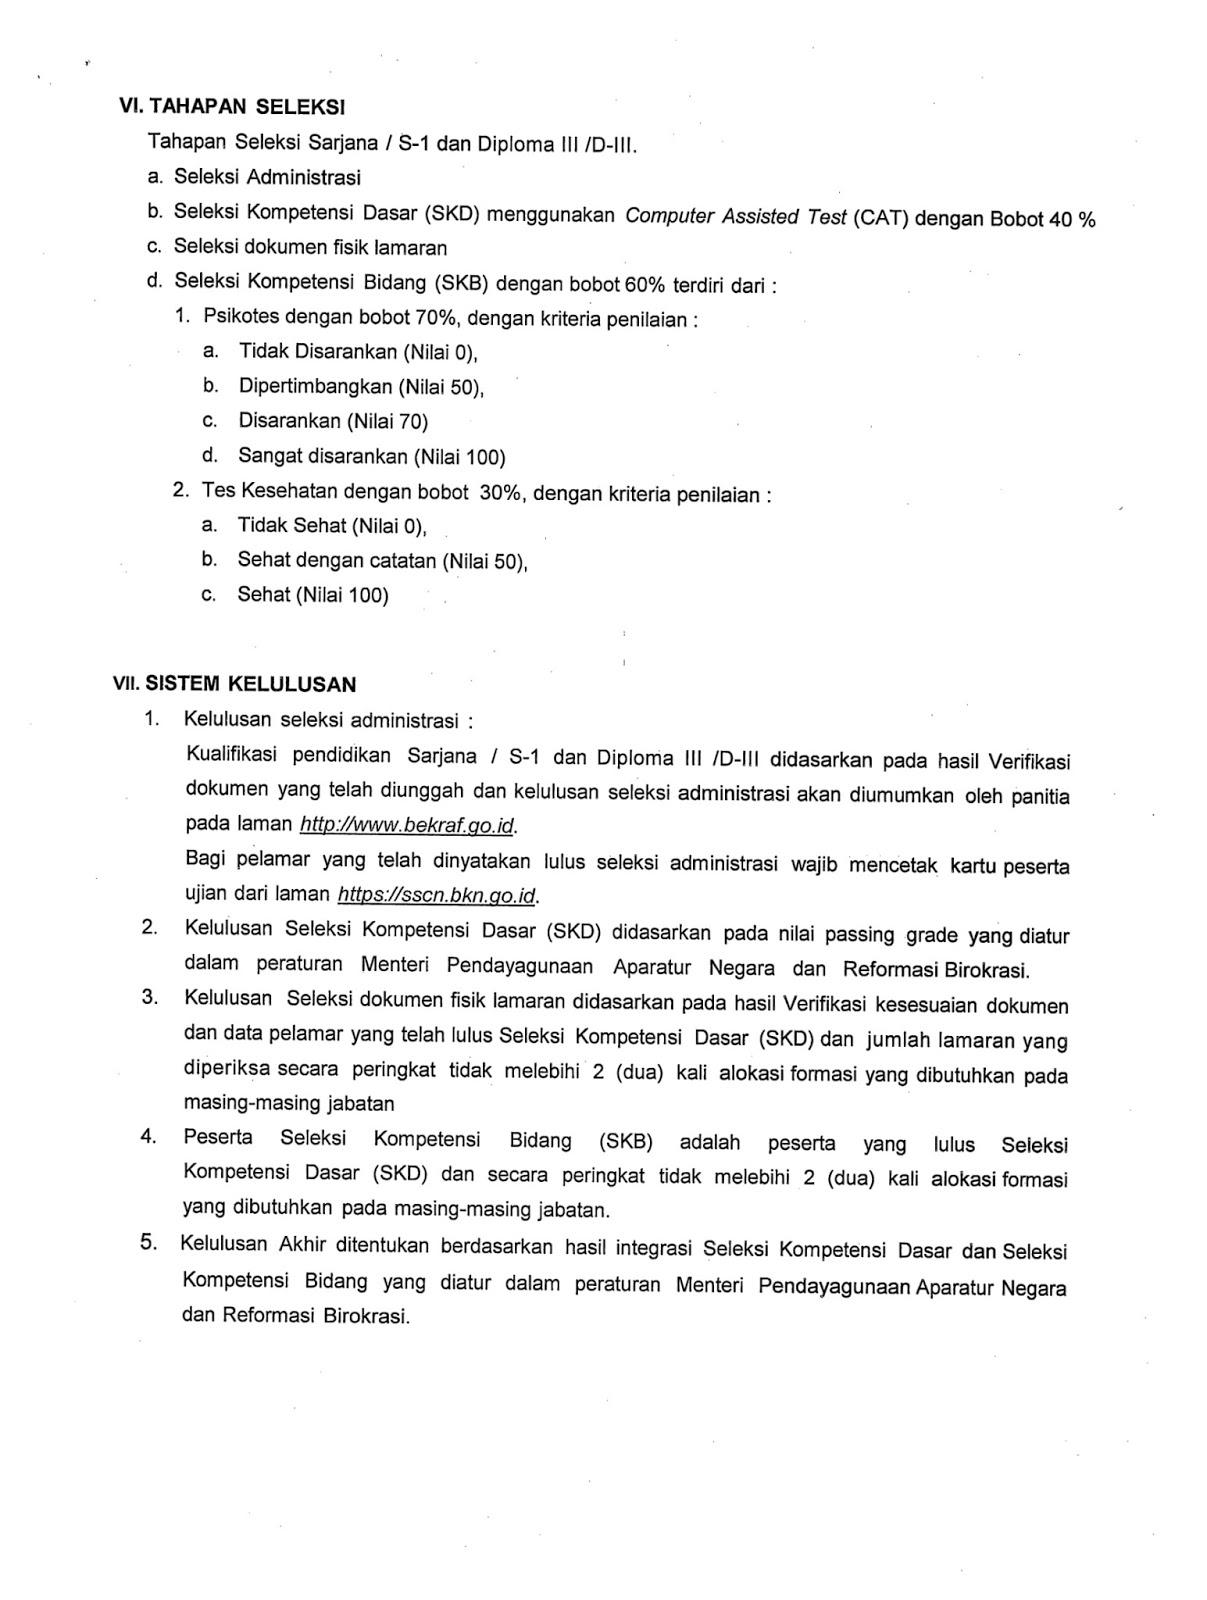 Lowongan Kerja Waitress di Solaria - Semarang (Gaji UMR)